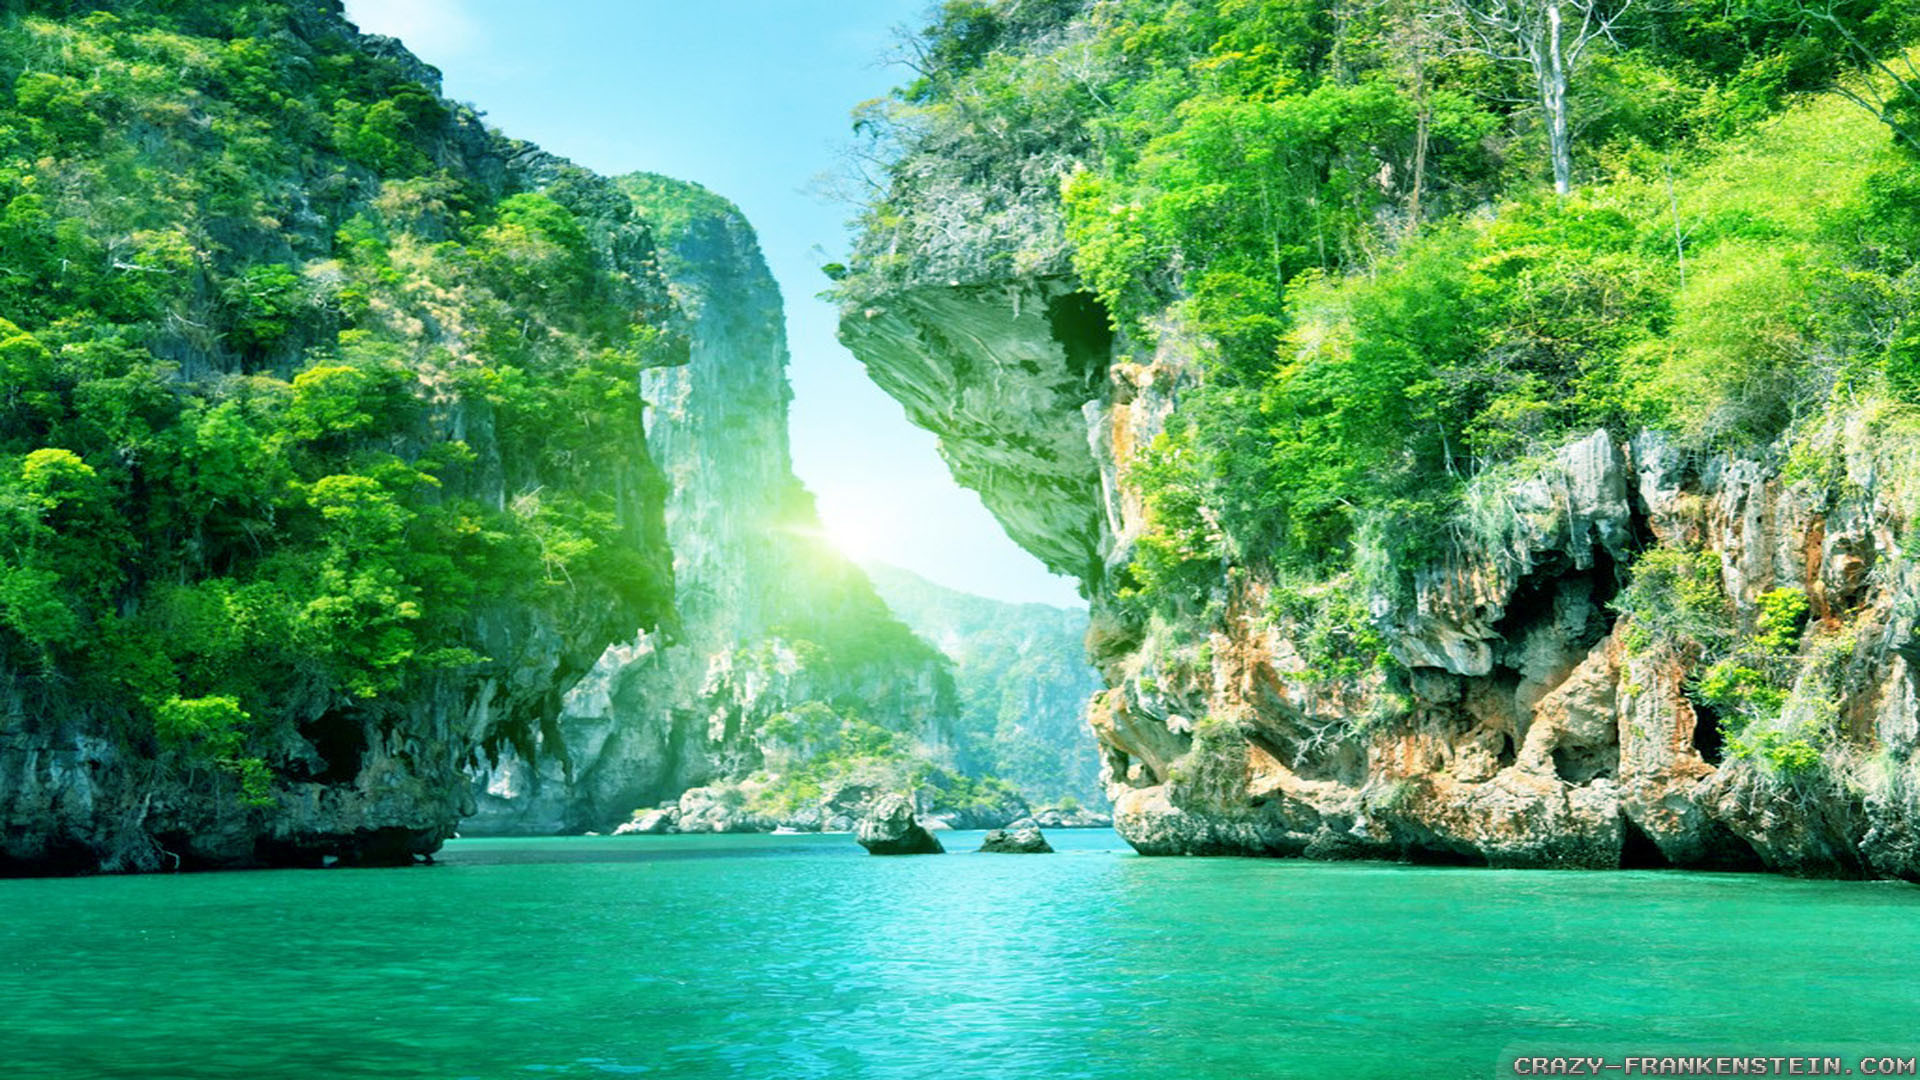 Wallpaper: Beautiful Summer nature wallpapers. Resolution: 1024×768 |  1280×1024 | 1600×1200. Widescreen Res: 1440×900 | 1680×1050 | 1920×1200. HD  : 1280×720 …